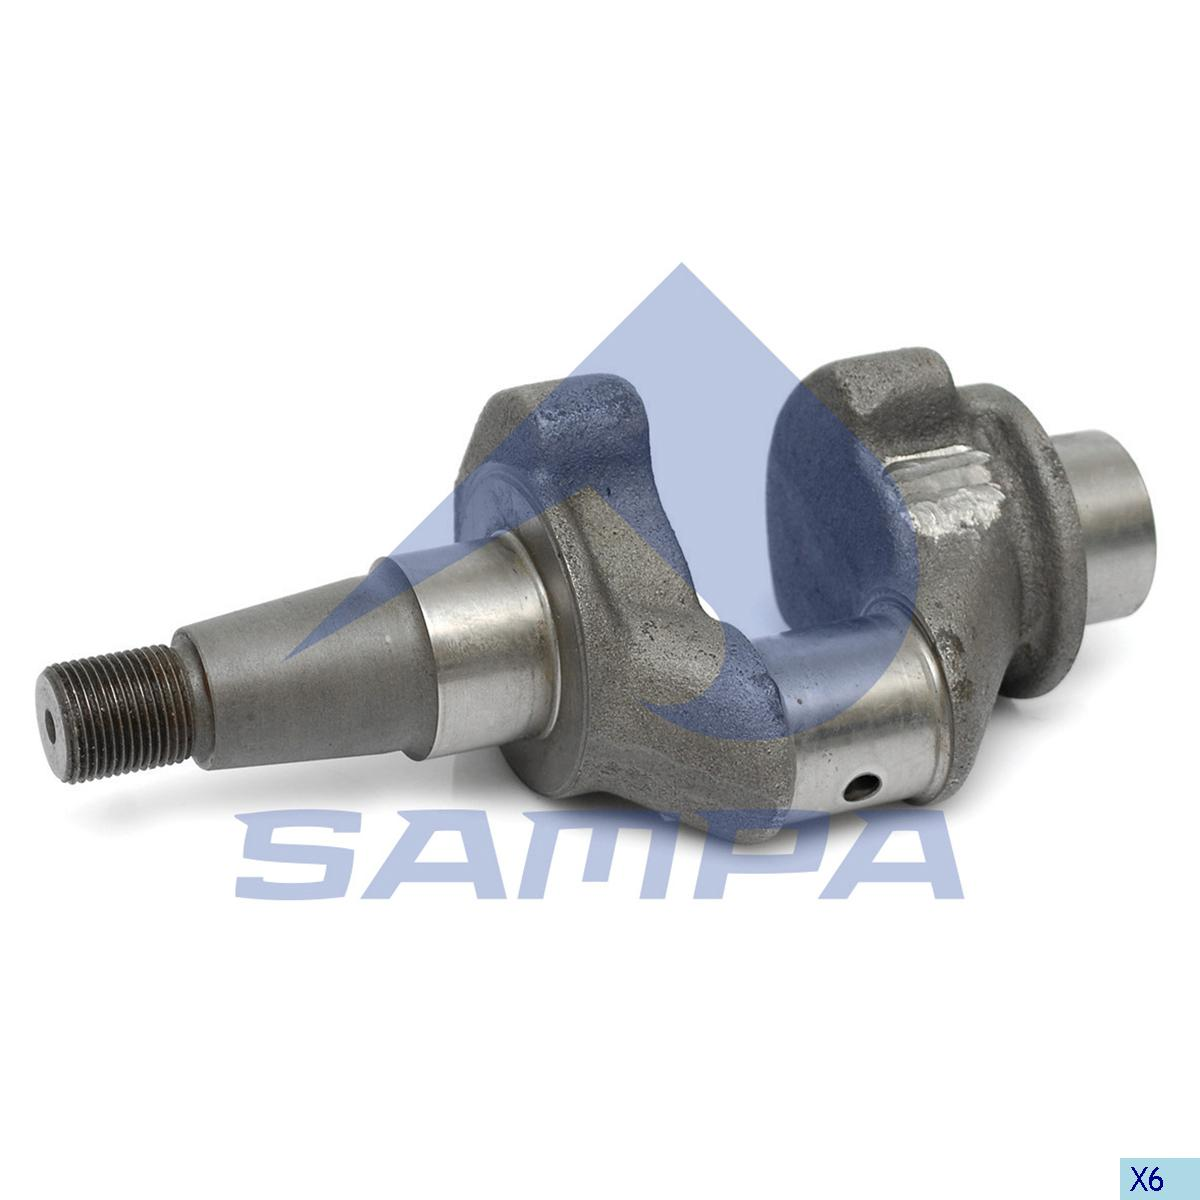 Crank Shaft, Cylinder Block, Volvo, Compressed Air System